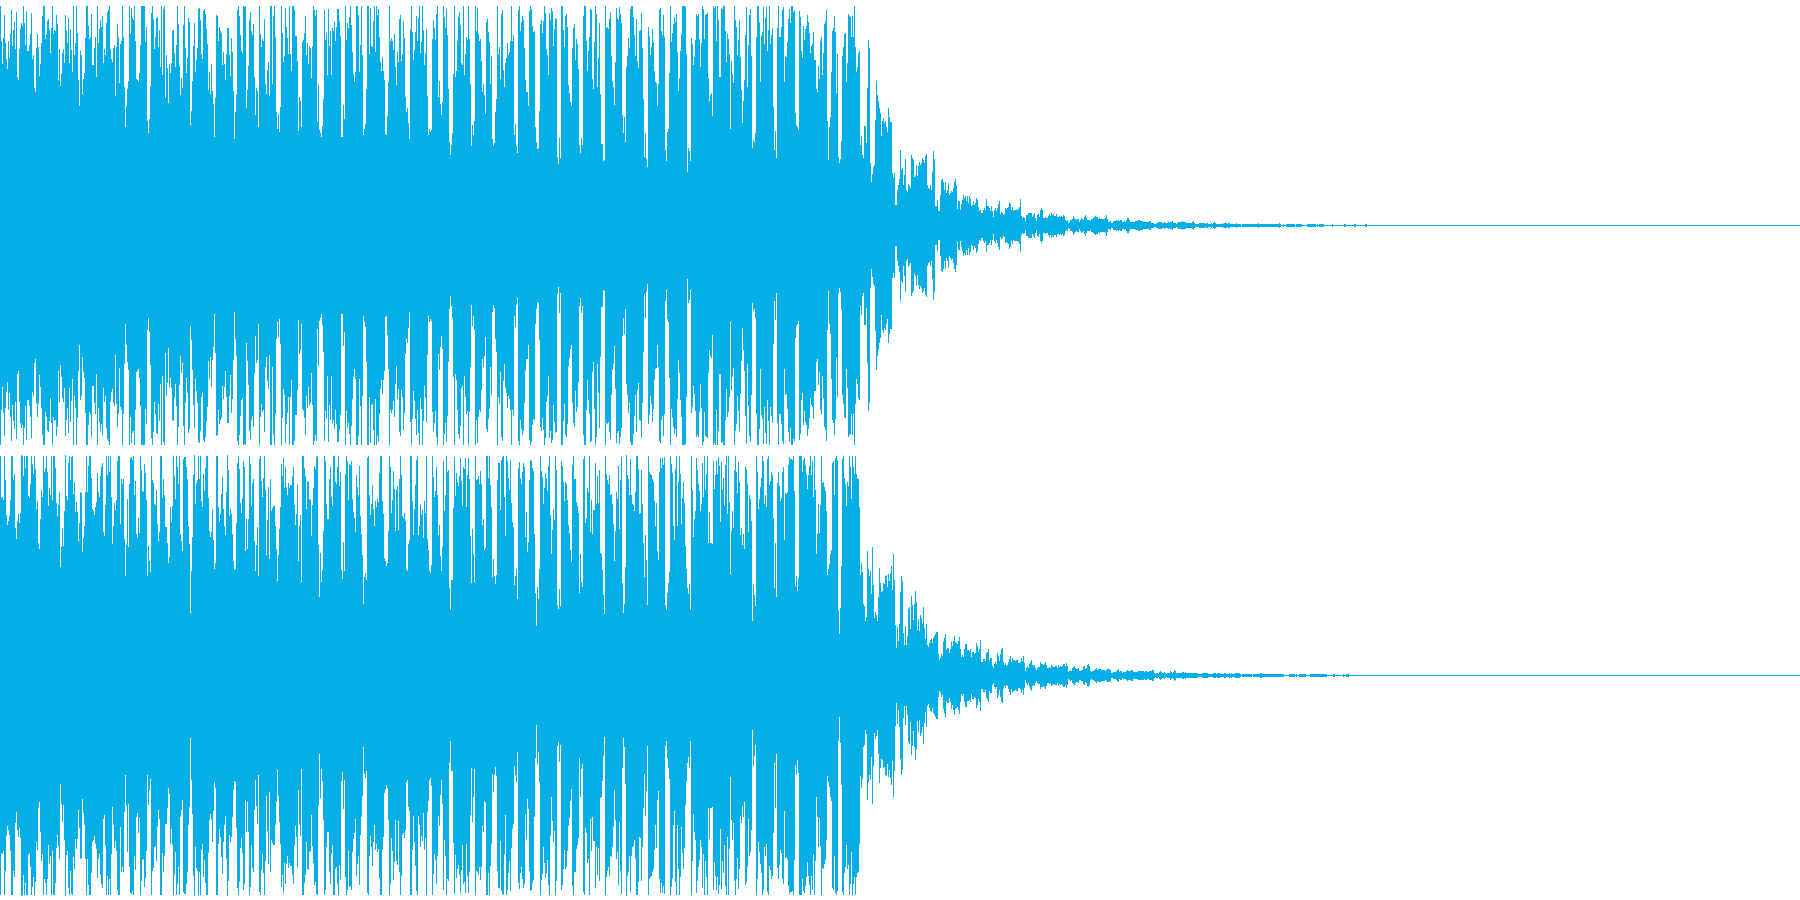 【EDM】クラブダンスミュージック7の再生済みの波形